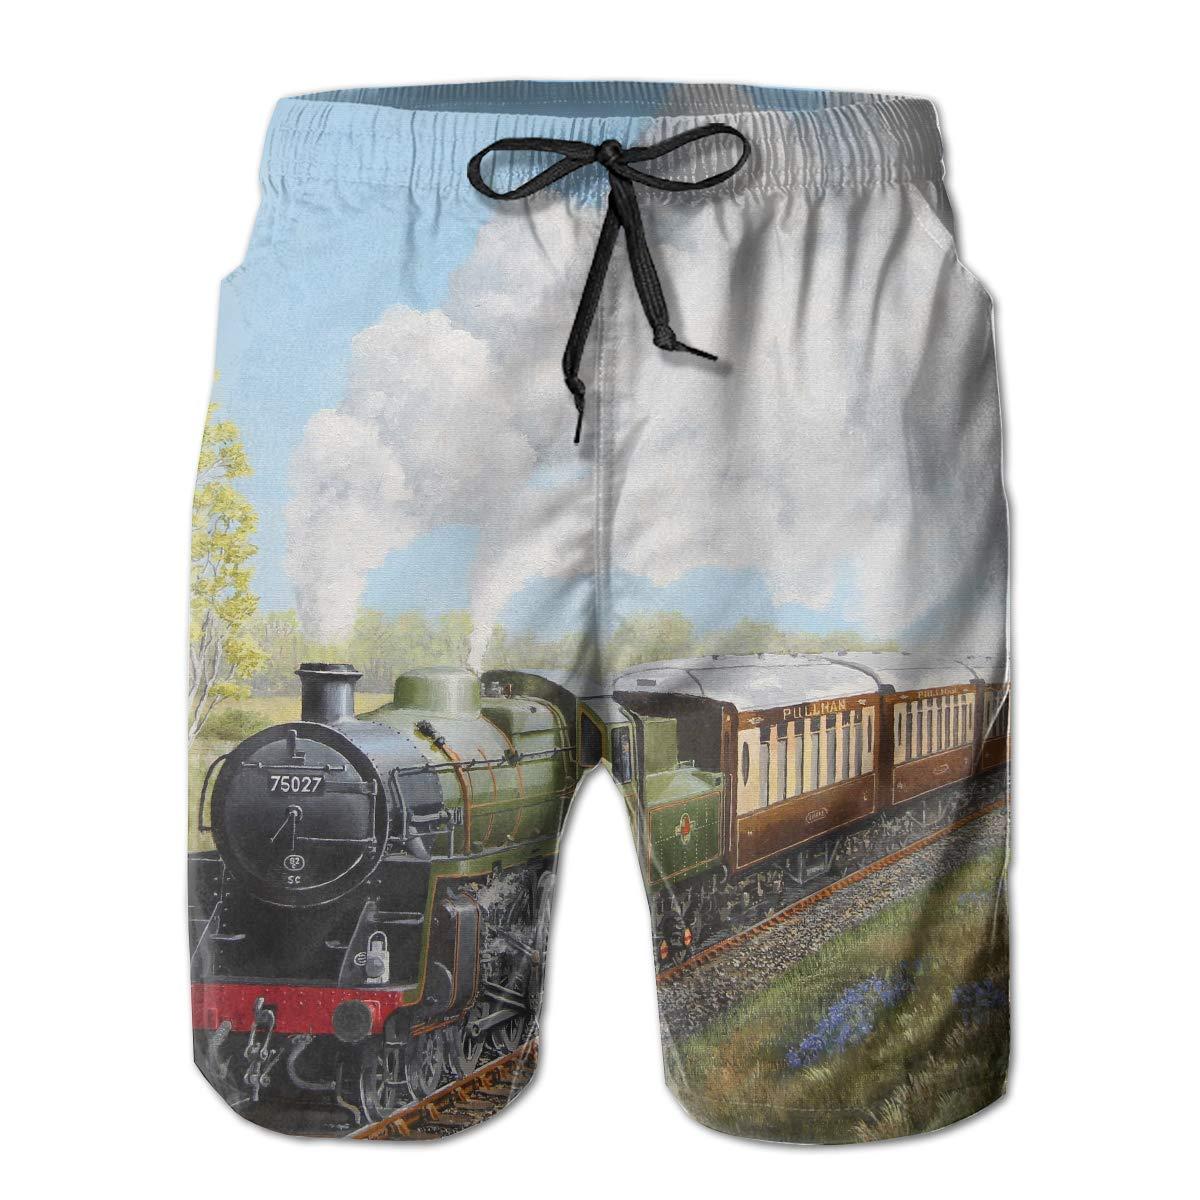 VIRTUALSHELF Mens Swim Trunks Steam Train and Railway Quick Dry Drawstring Surfing Beach Board Shorts with Pockets